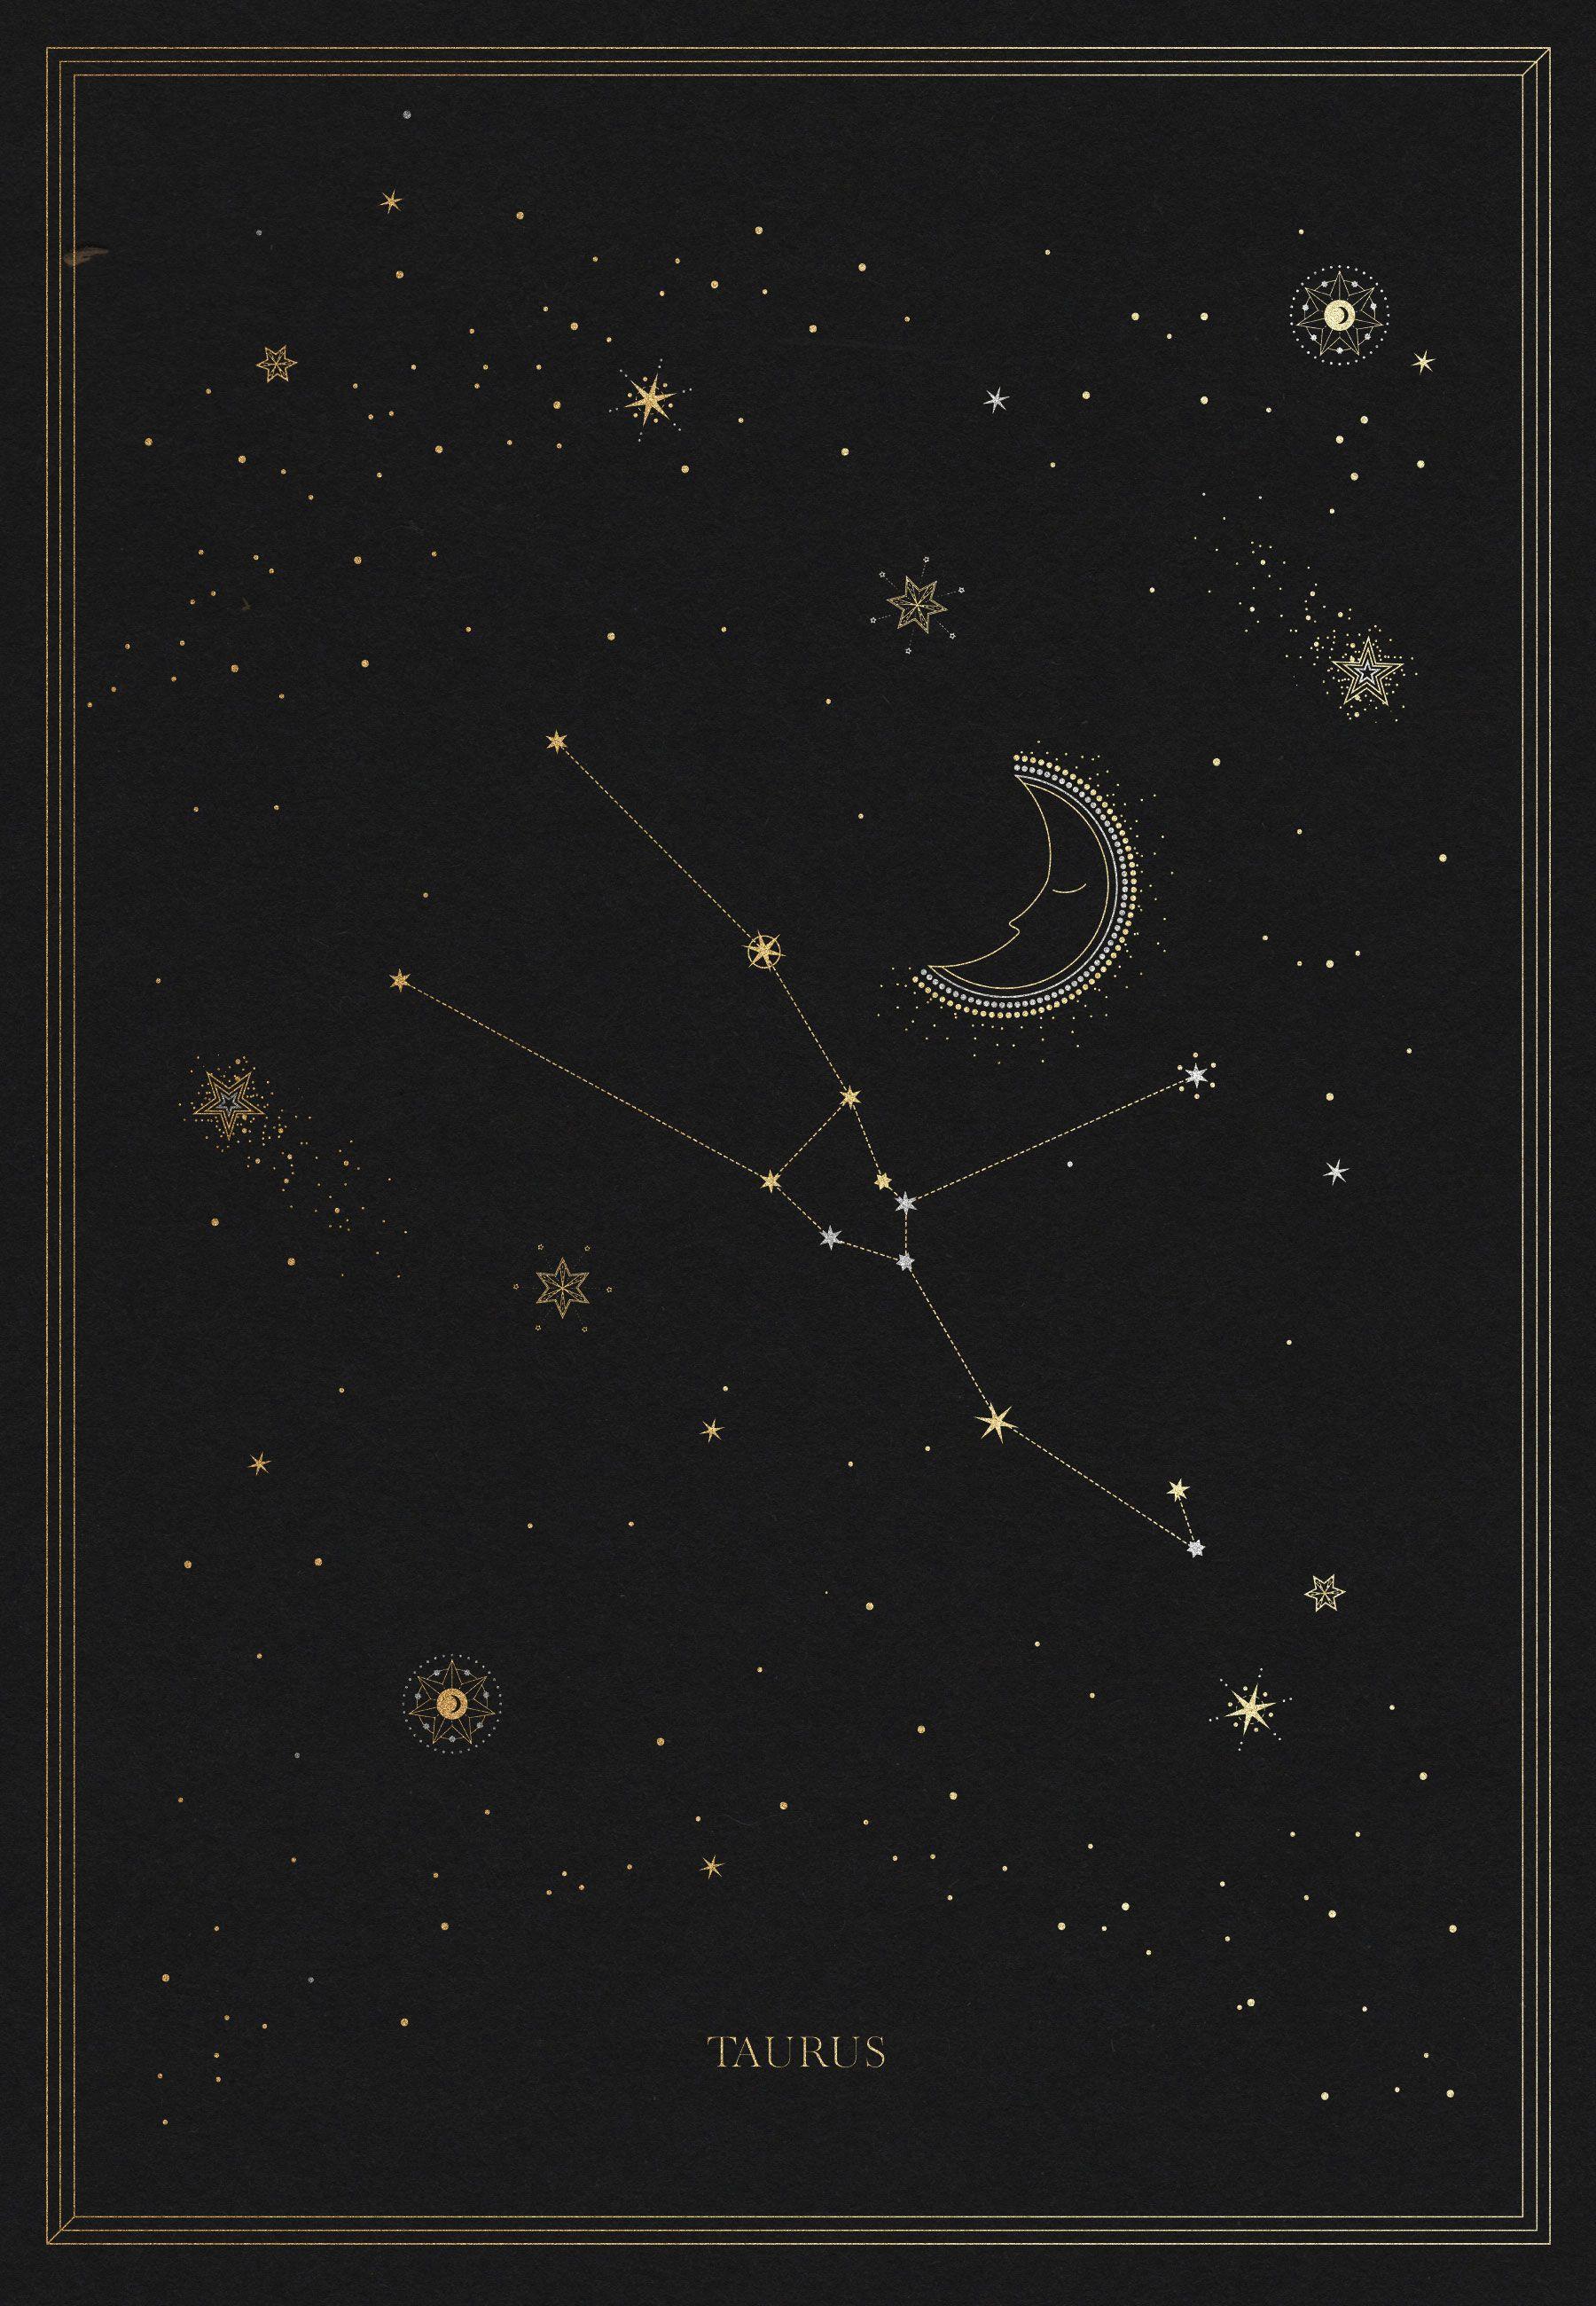 The Taurus Constellation Arte tauro Constelacion tauro y 1800x2600